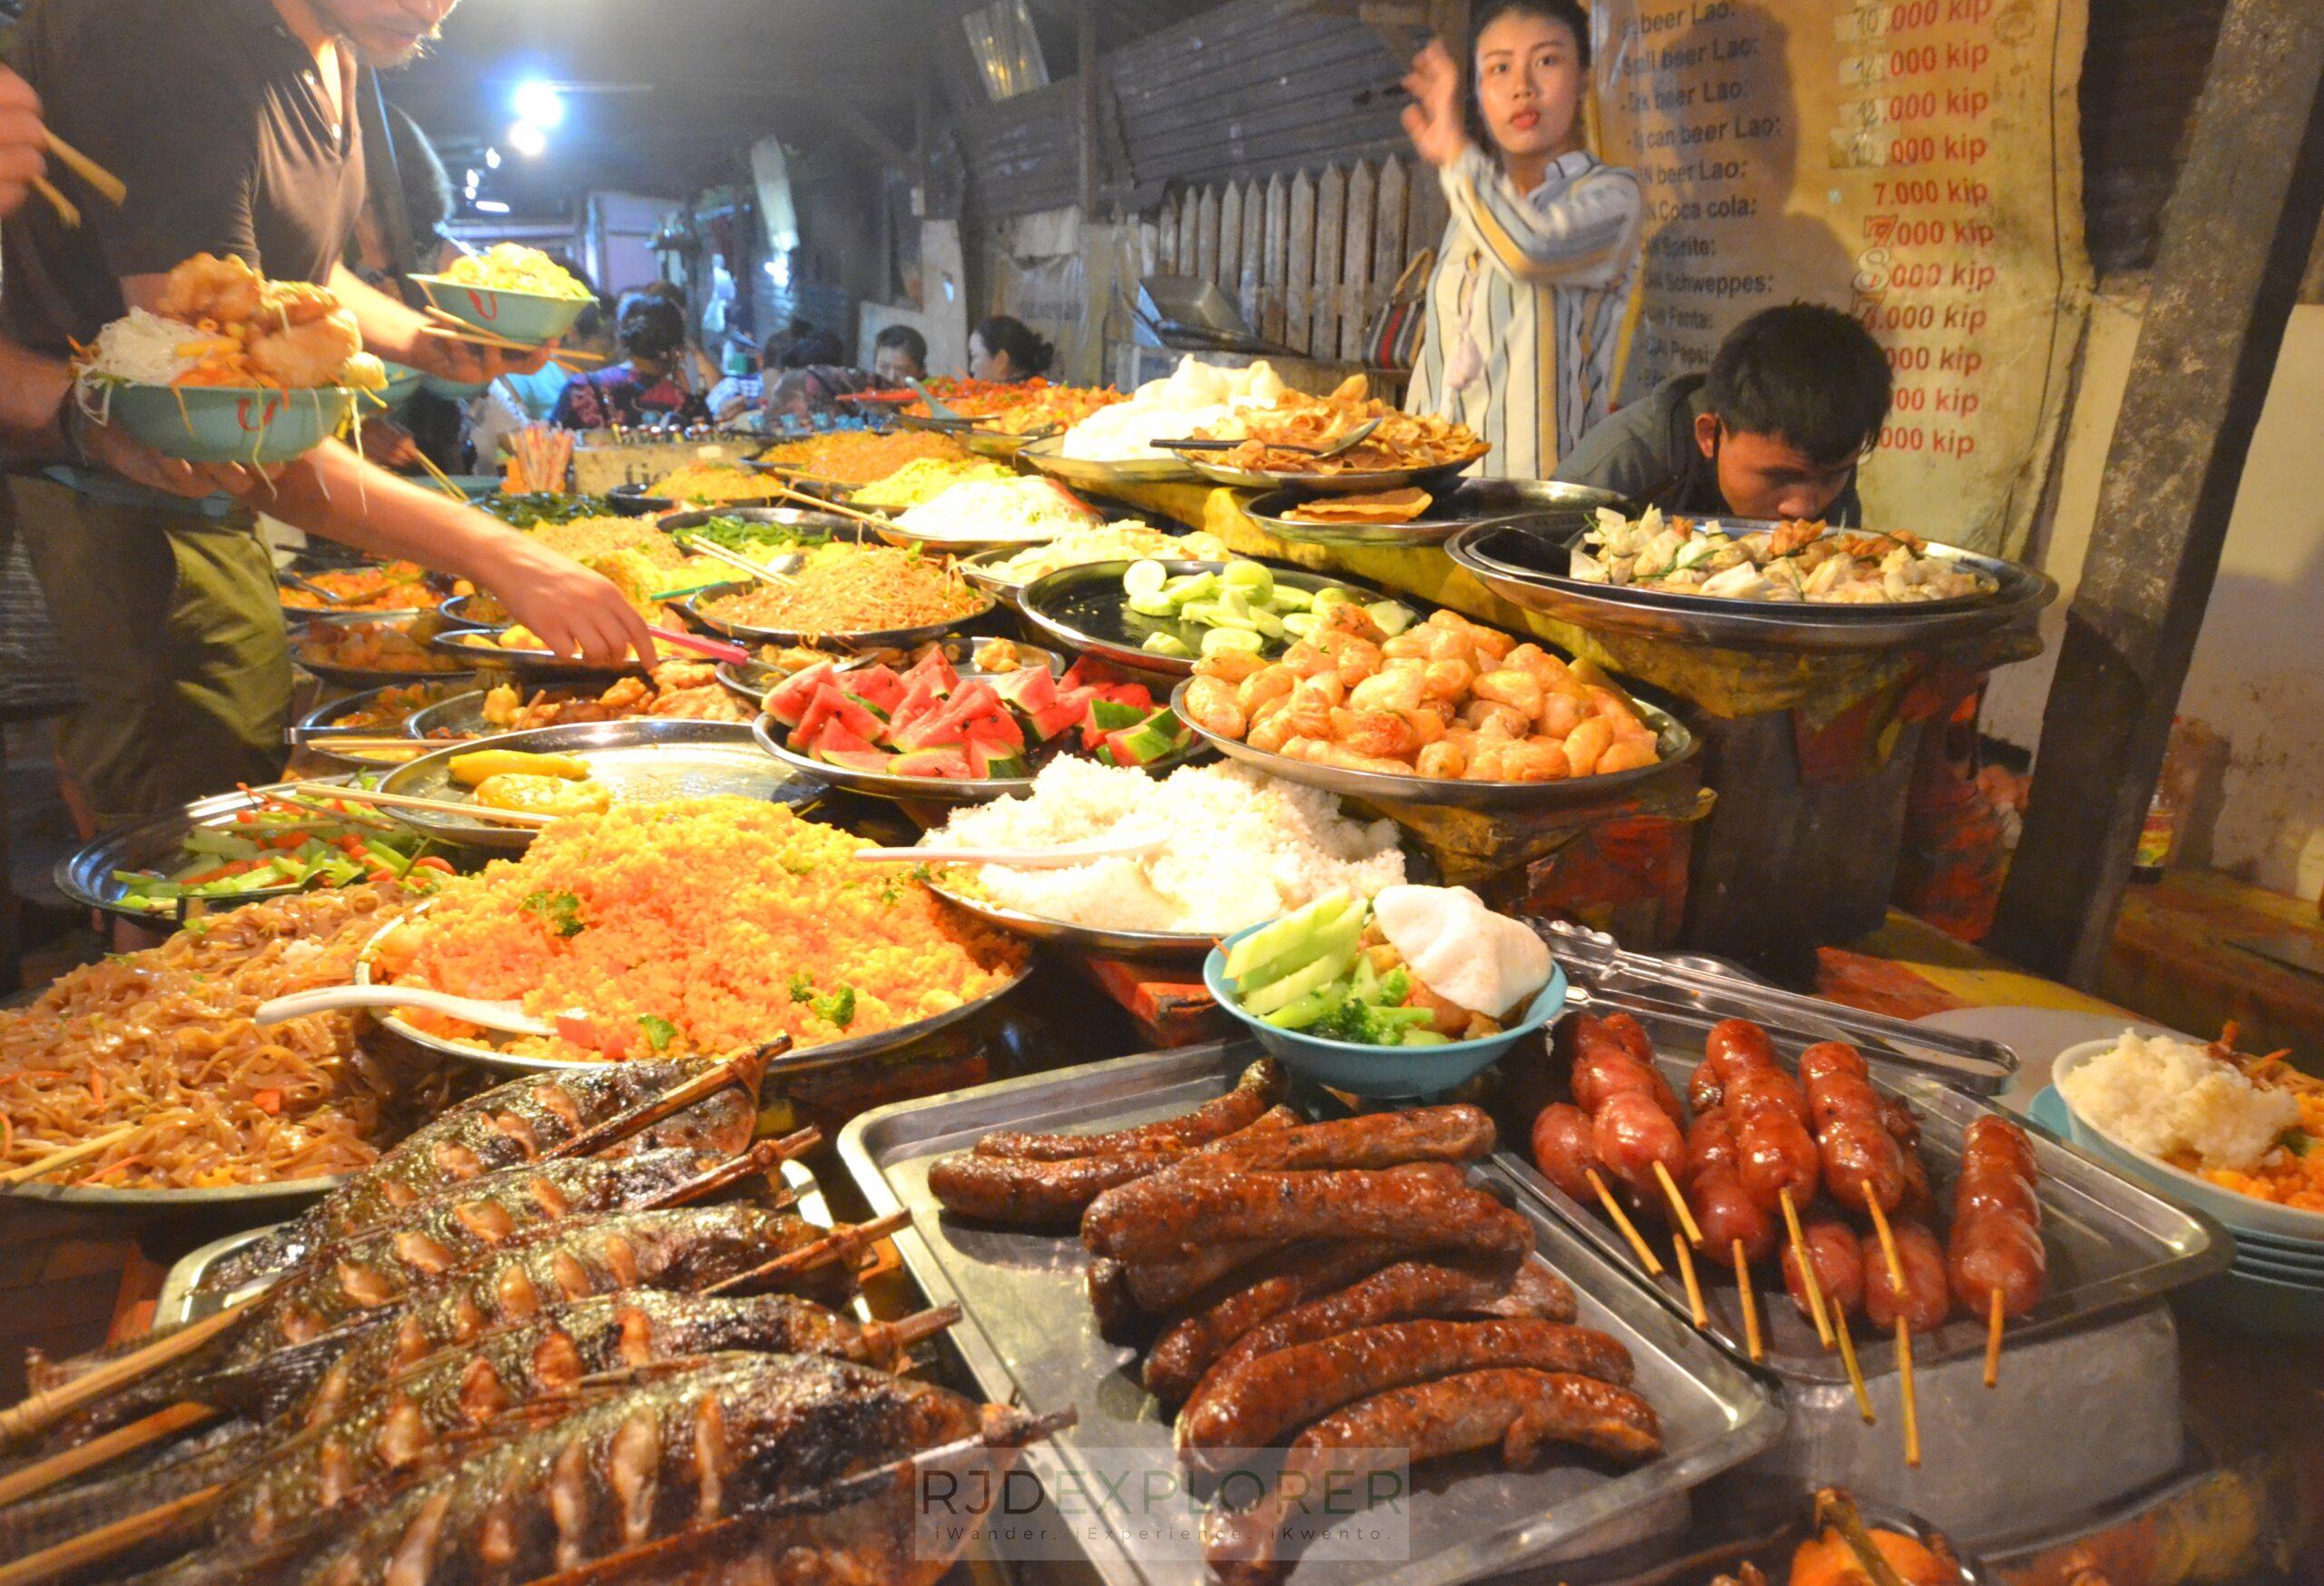 laos itinerary diy vegetable buffet luang prabang